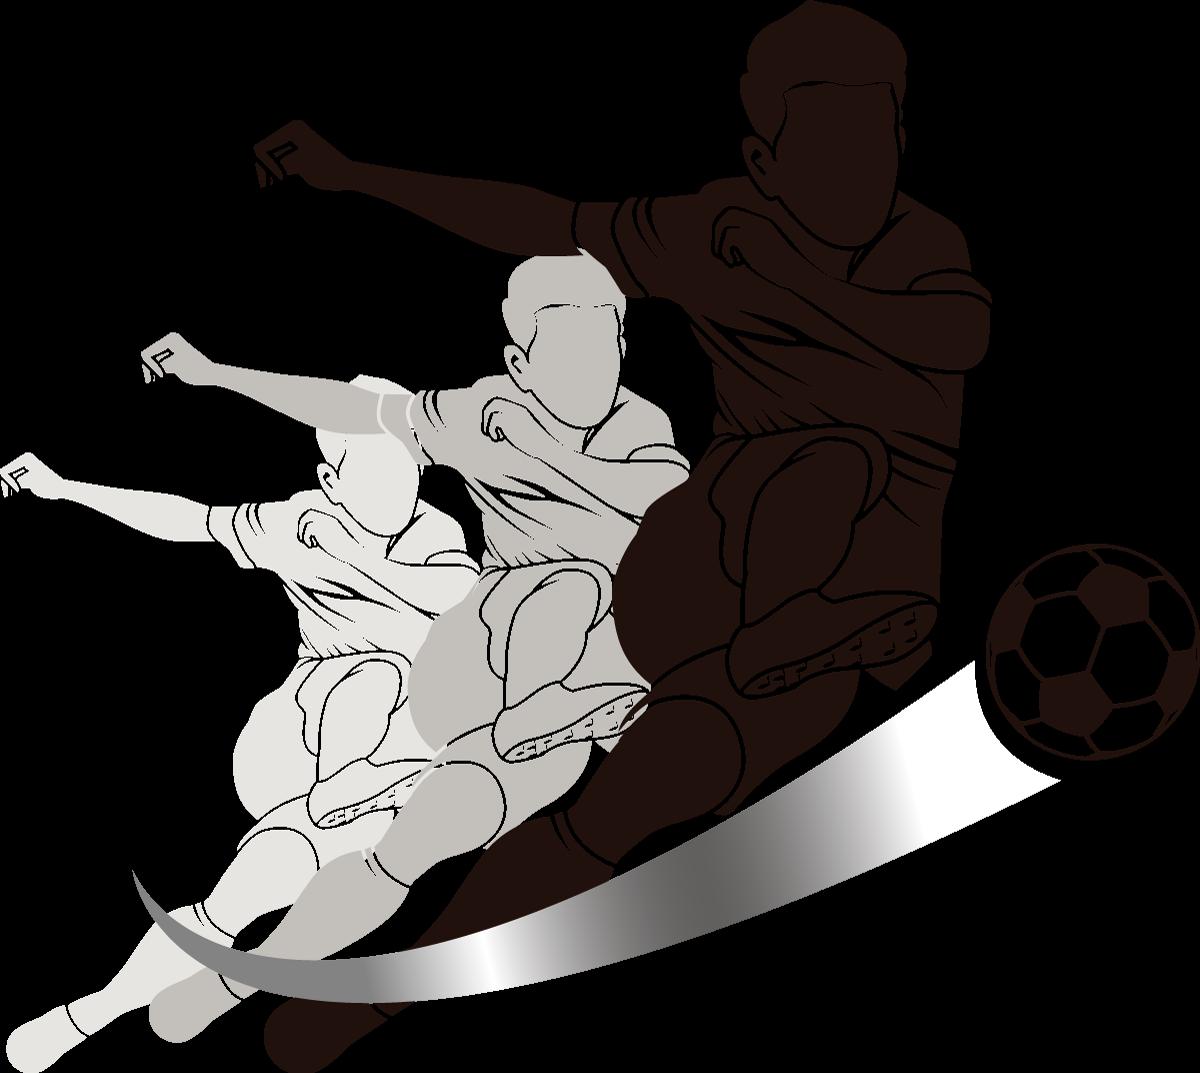 Картинка про, футбол картинка пнг